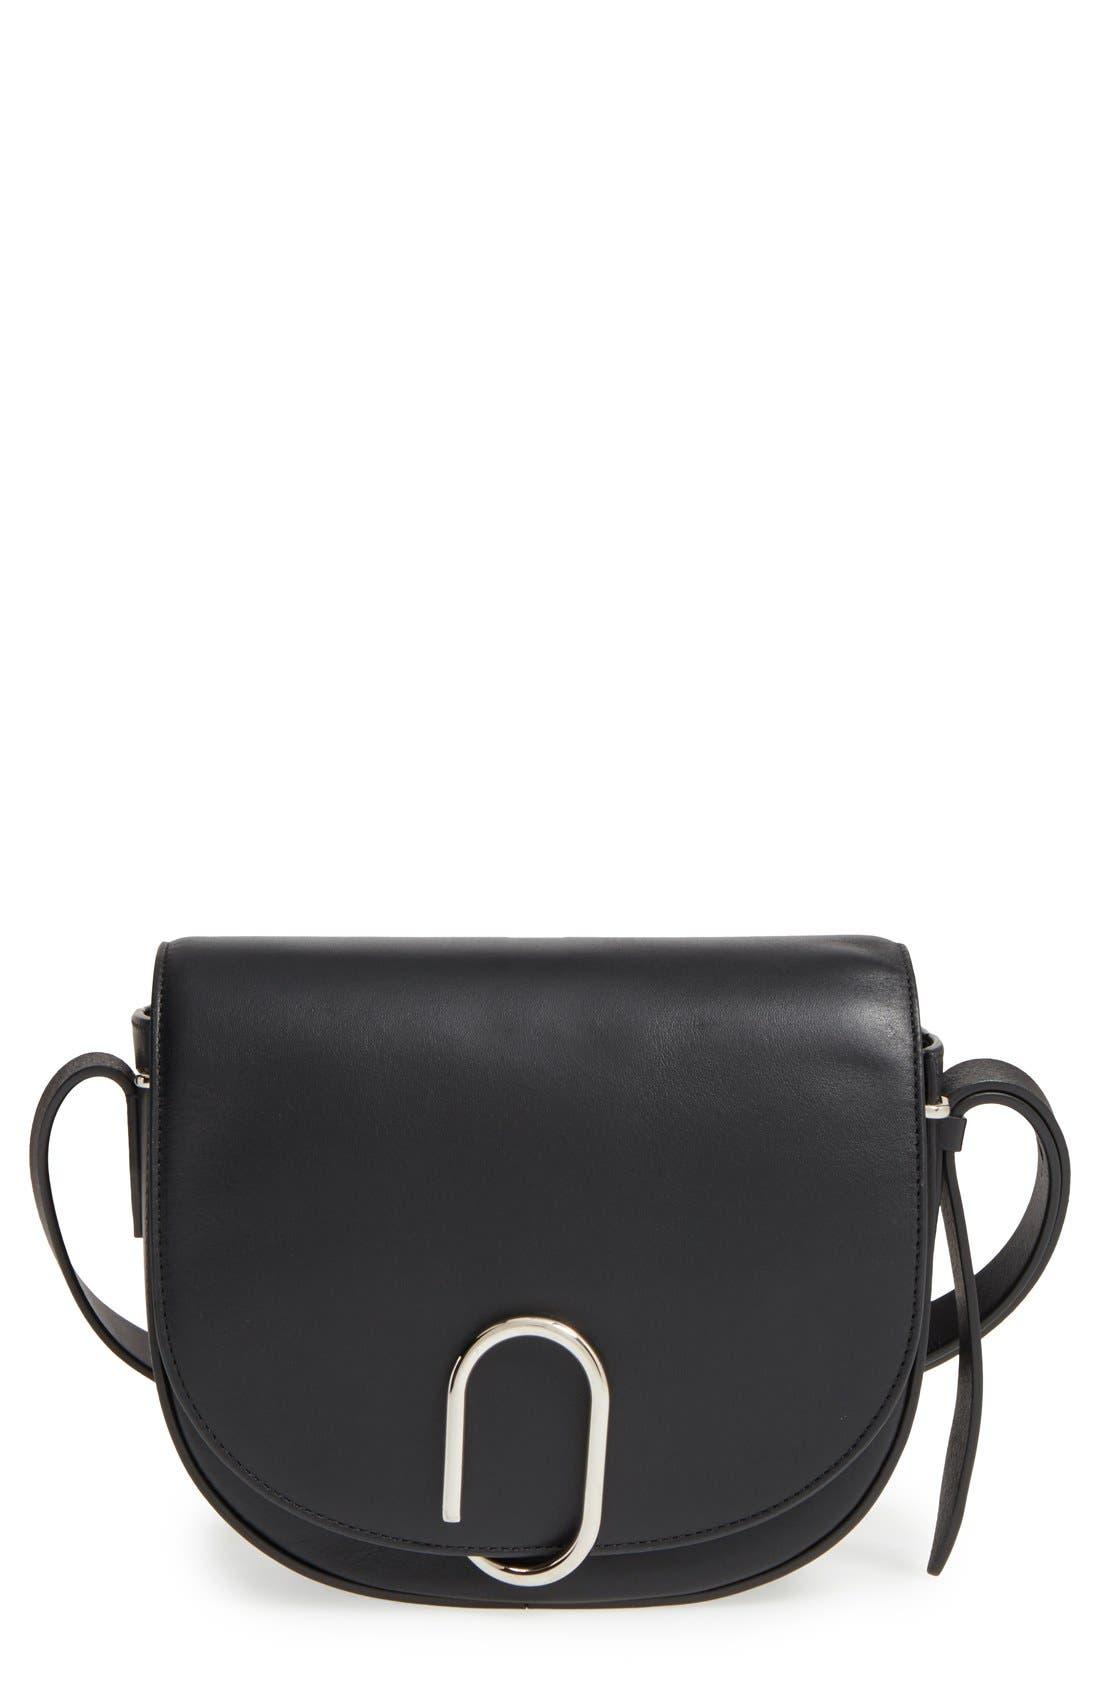 Main Image - 3.1 Phillip Lim Alix Leather Saddle Bag